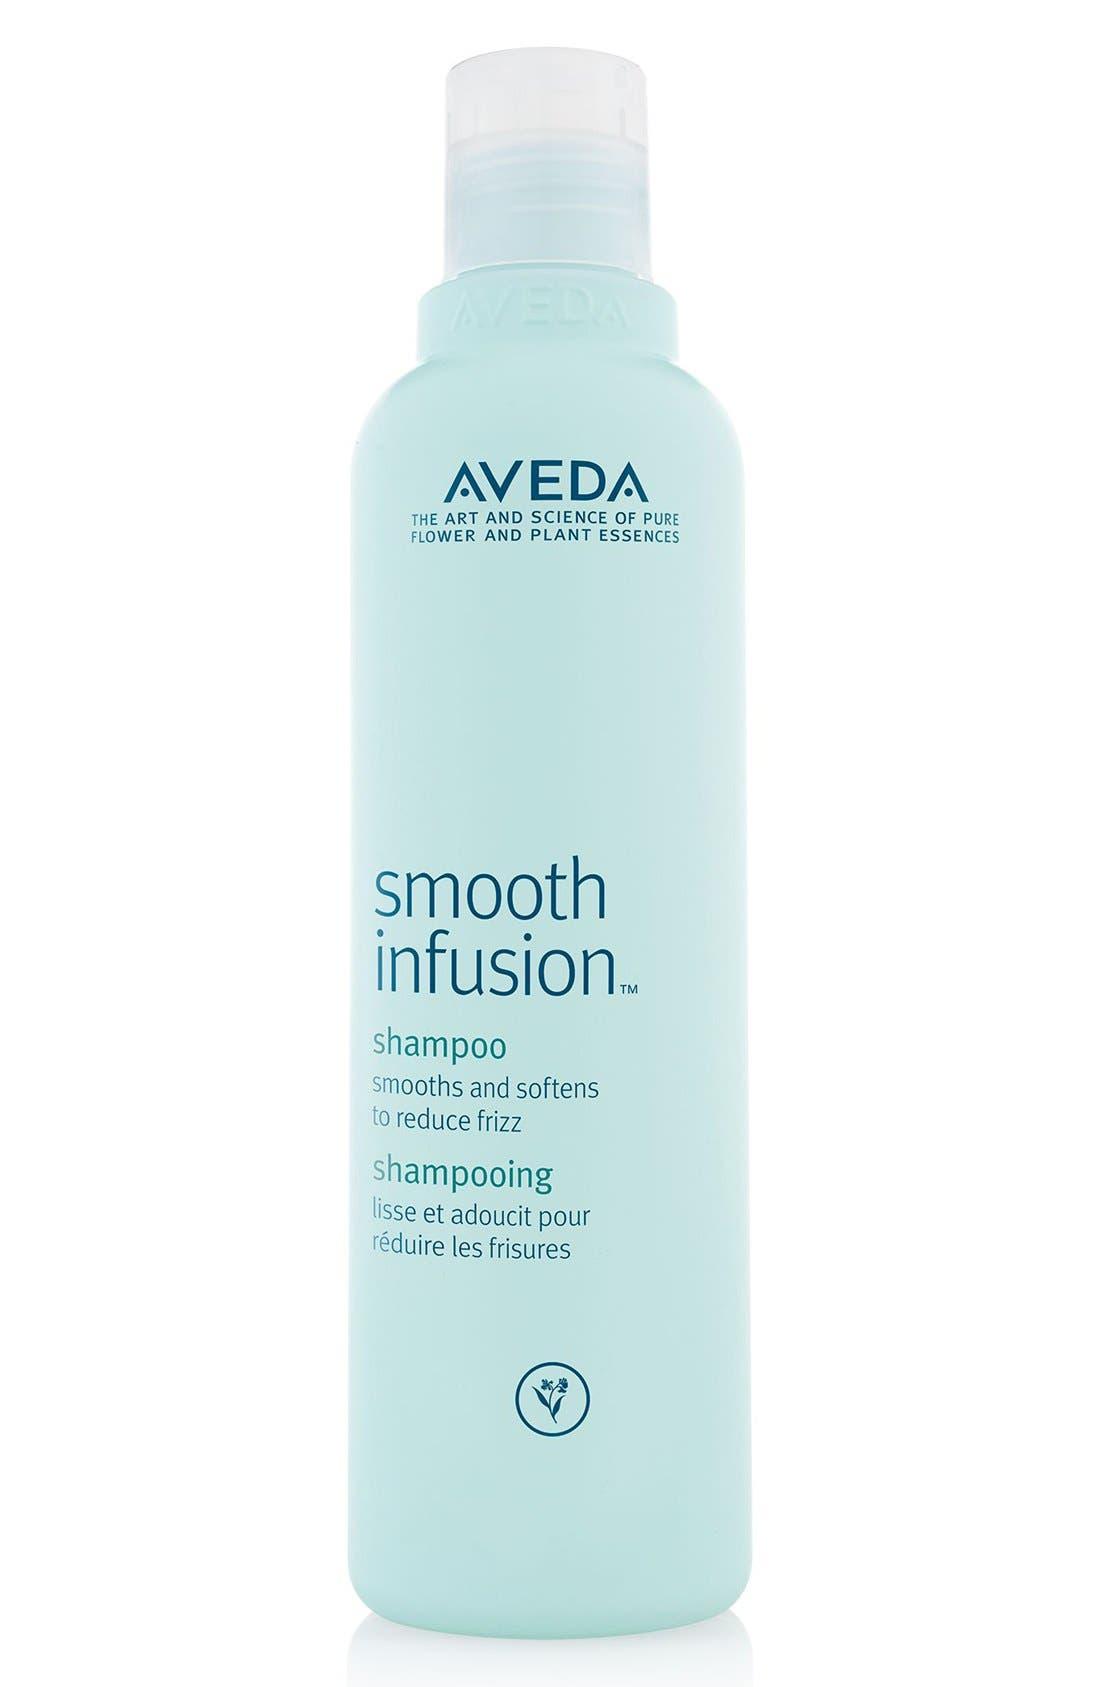 Aveda 'smooth infusion™' Shampoo